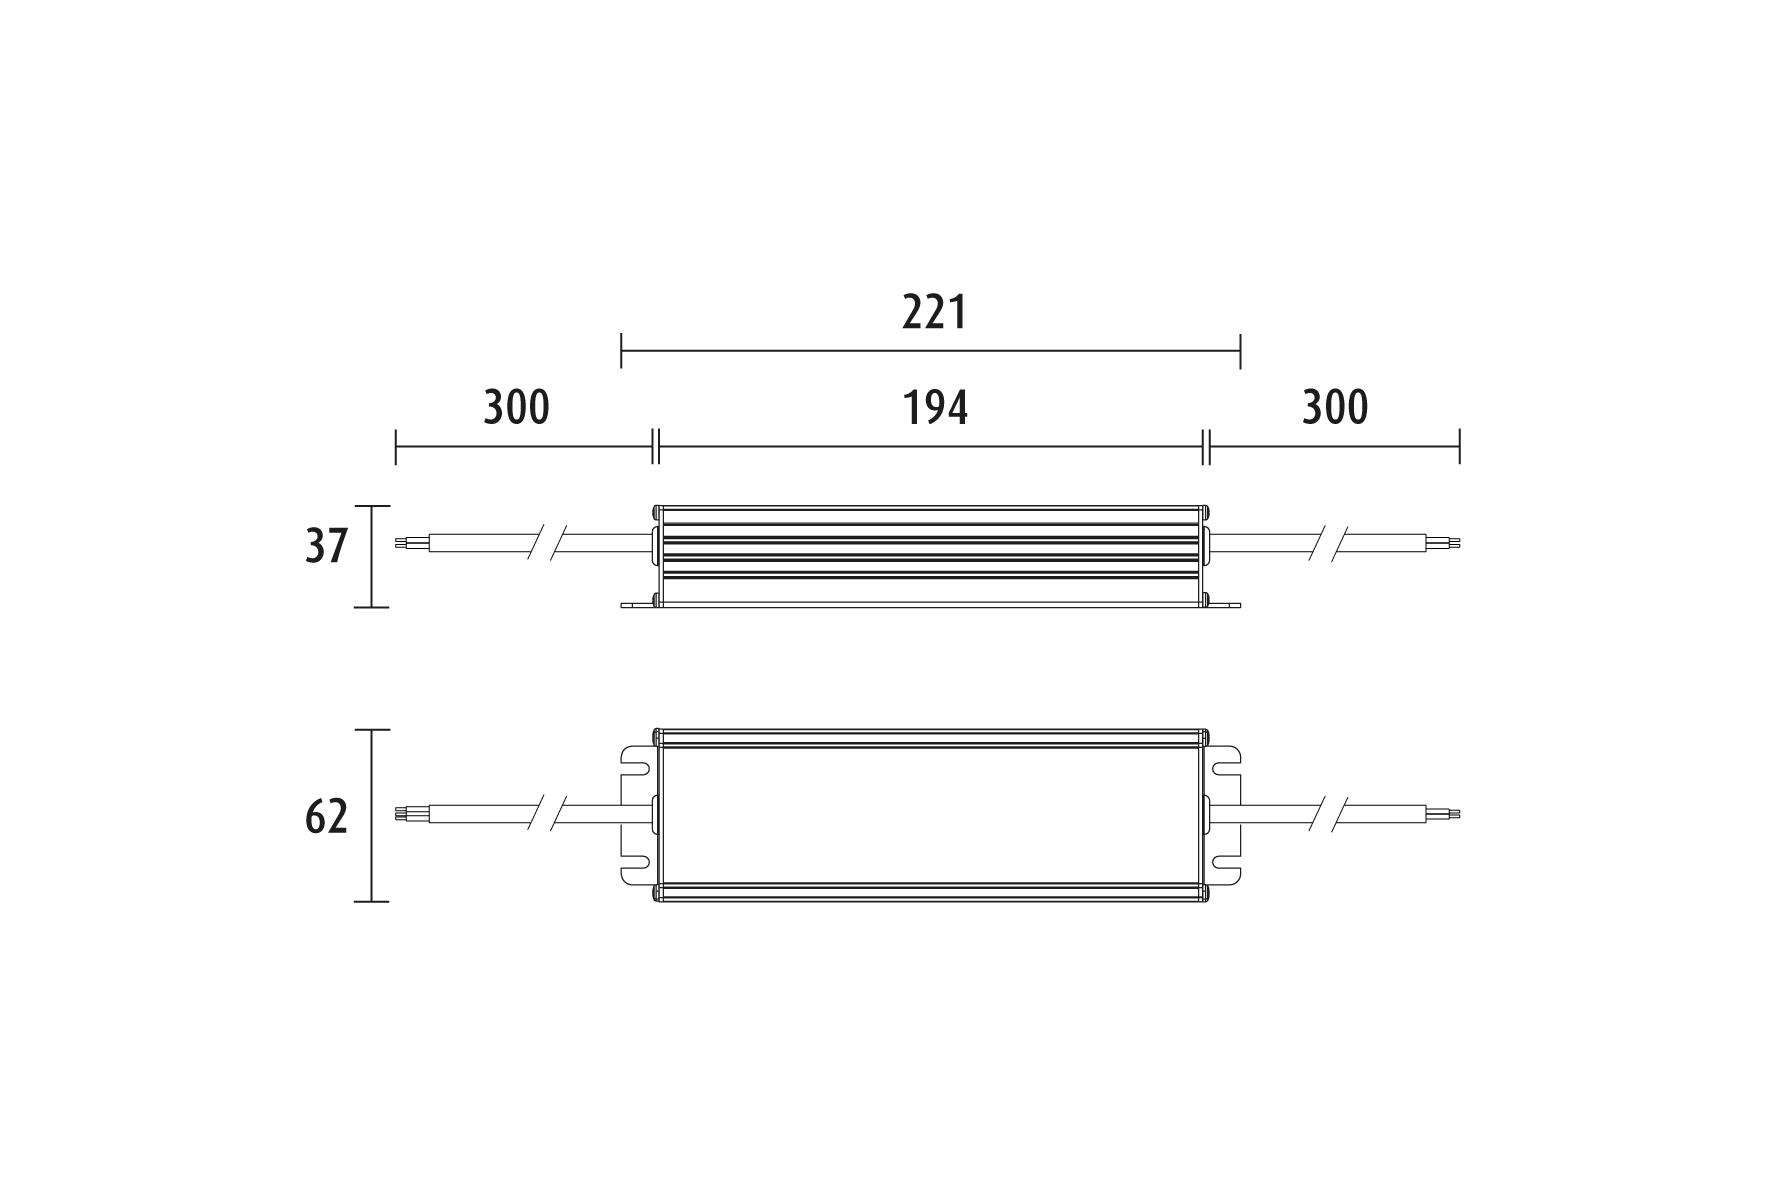 LIMENTE LED 24 V virtalähde, IP67